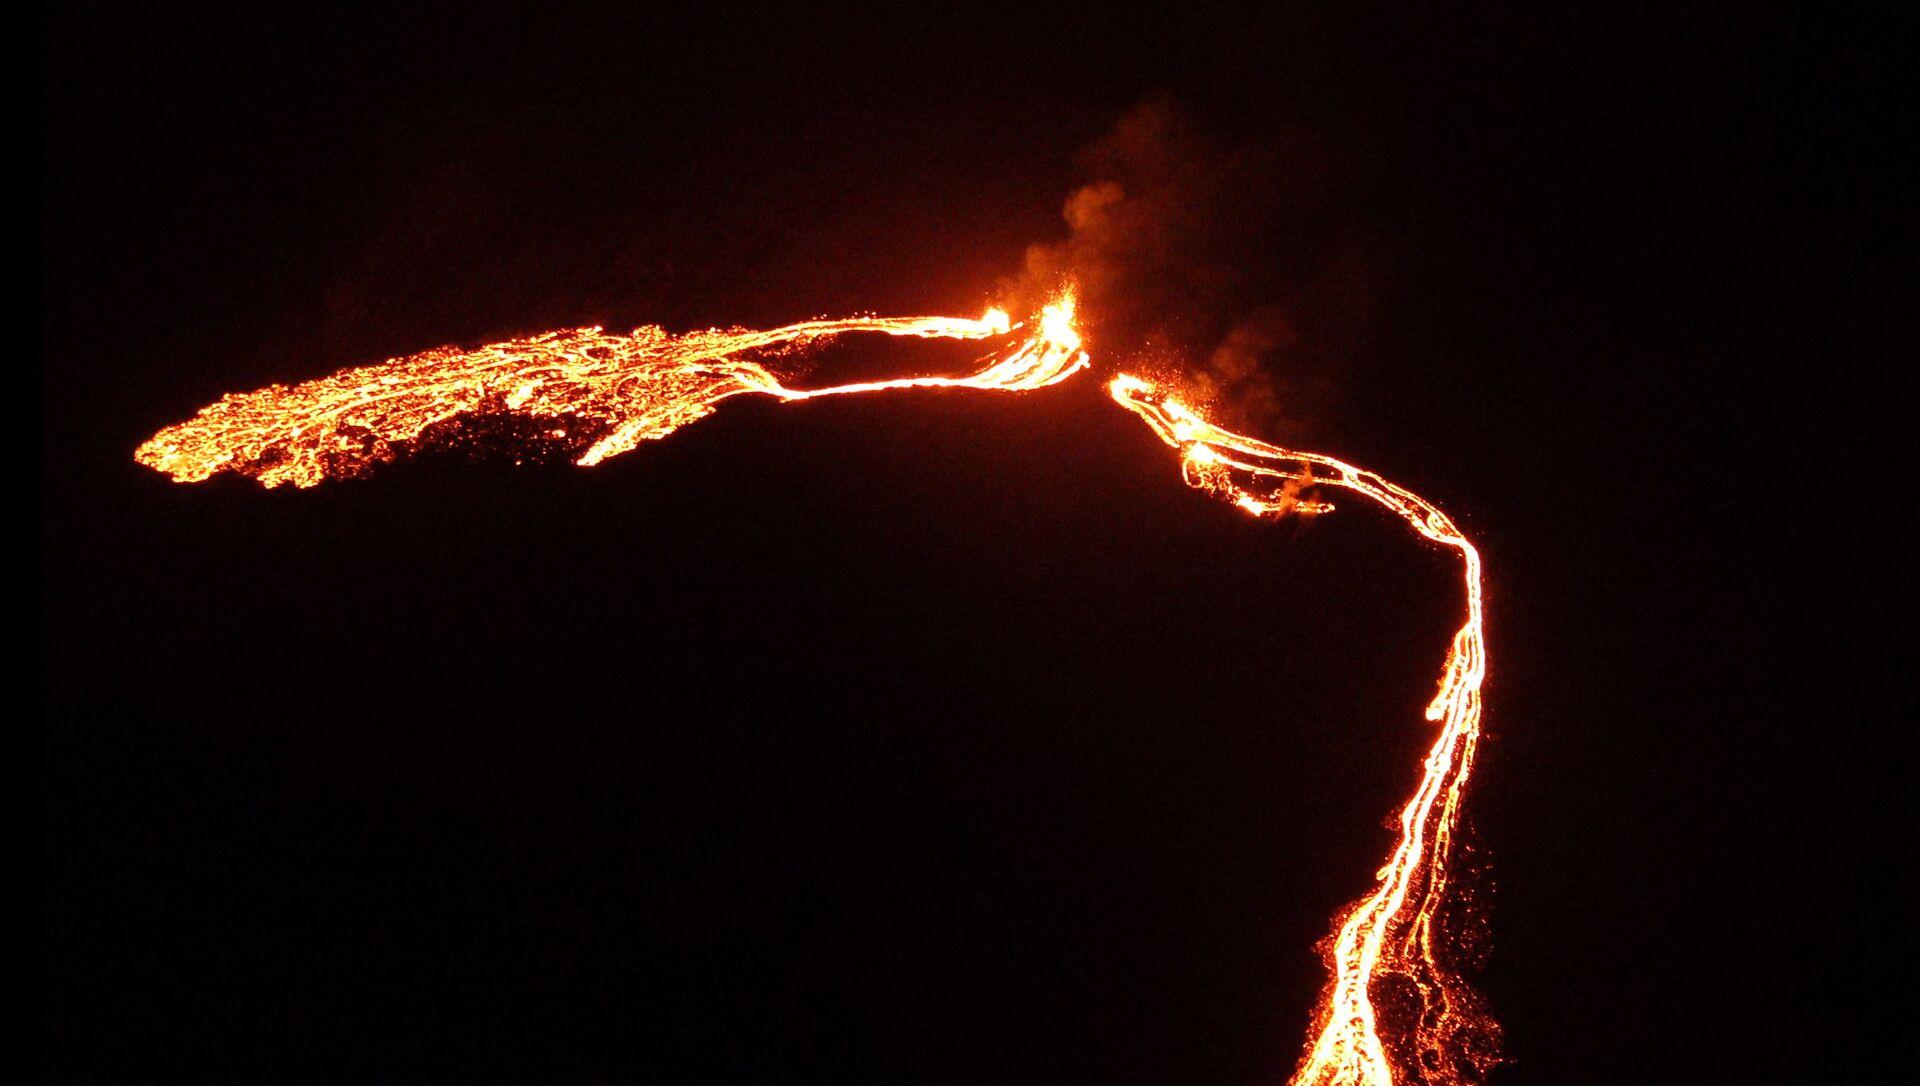 Une éruption volcanique près de Reykjavik - Sputnik France, 1920, 20.03.2021